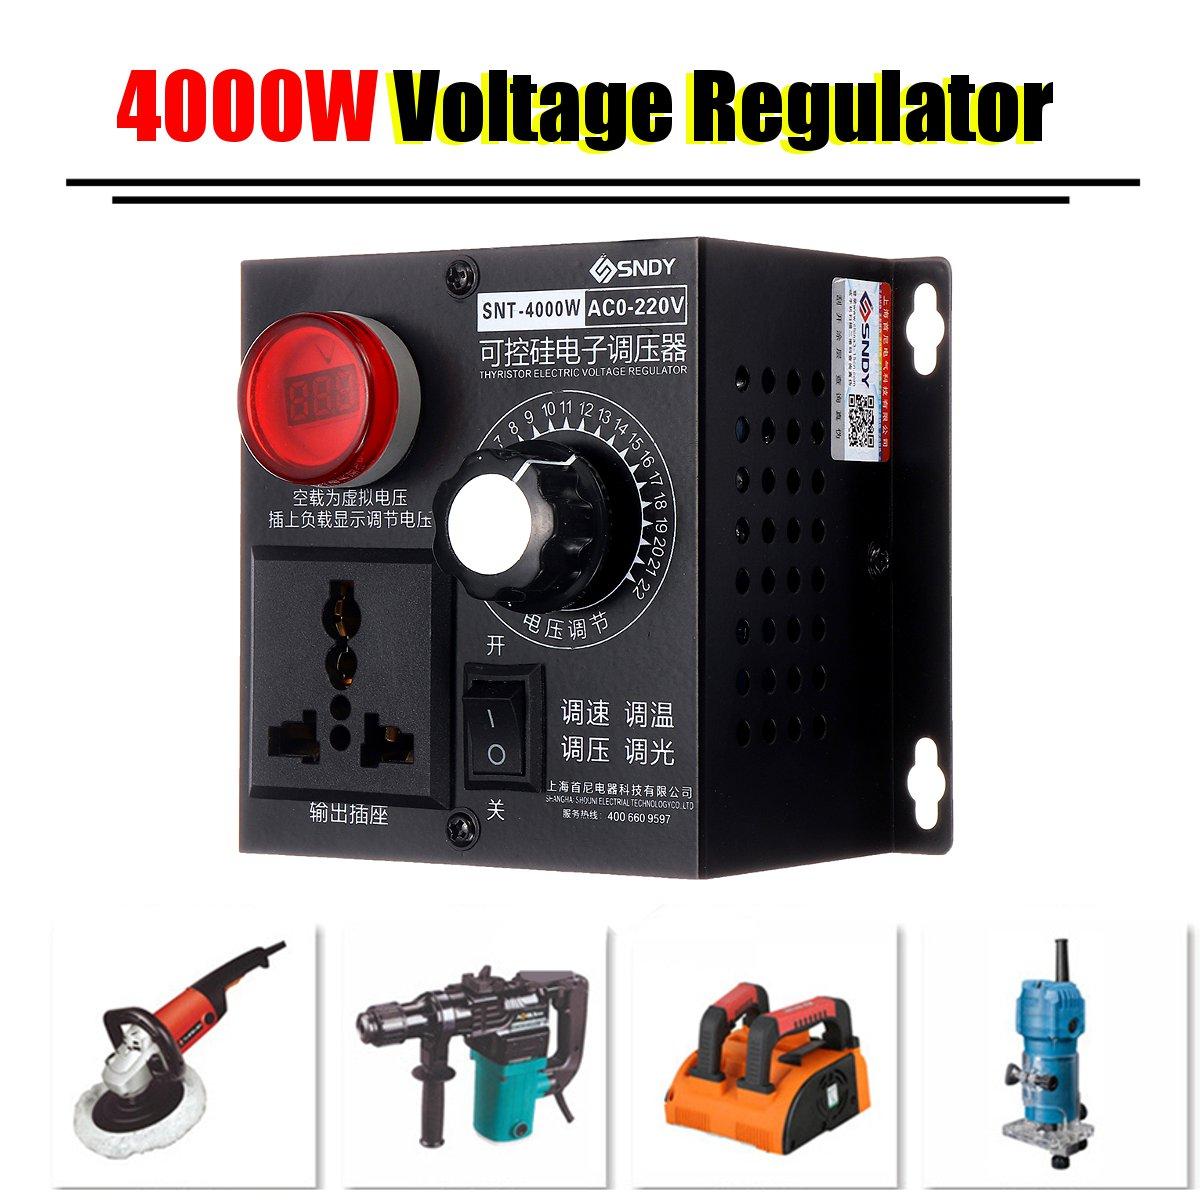 High-power Motor Fan 18A AC 220V 4000W Voltage Regulator Thyristor Electronic Variable Speed Controller